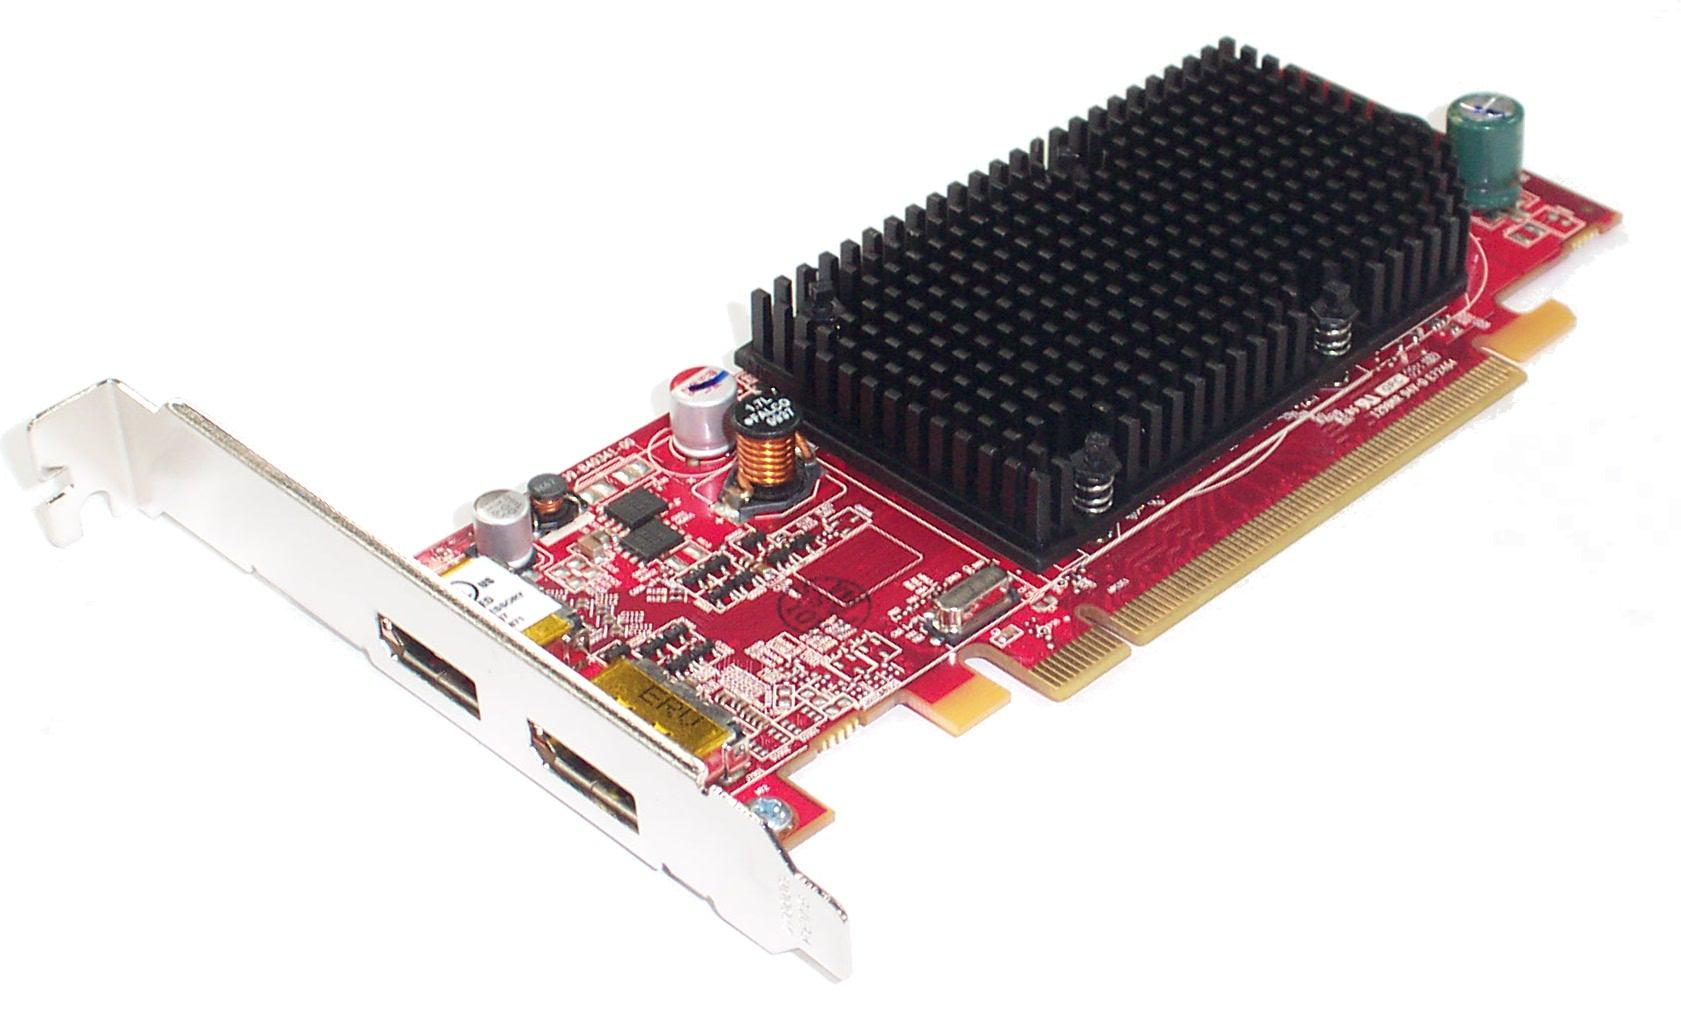 7CJHP Dell ATI Radeon FirePro 2260 256MB DP/DP PCIe Graphics Card